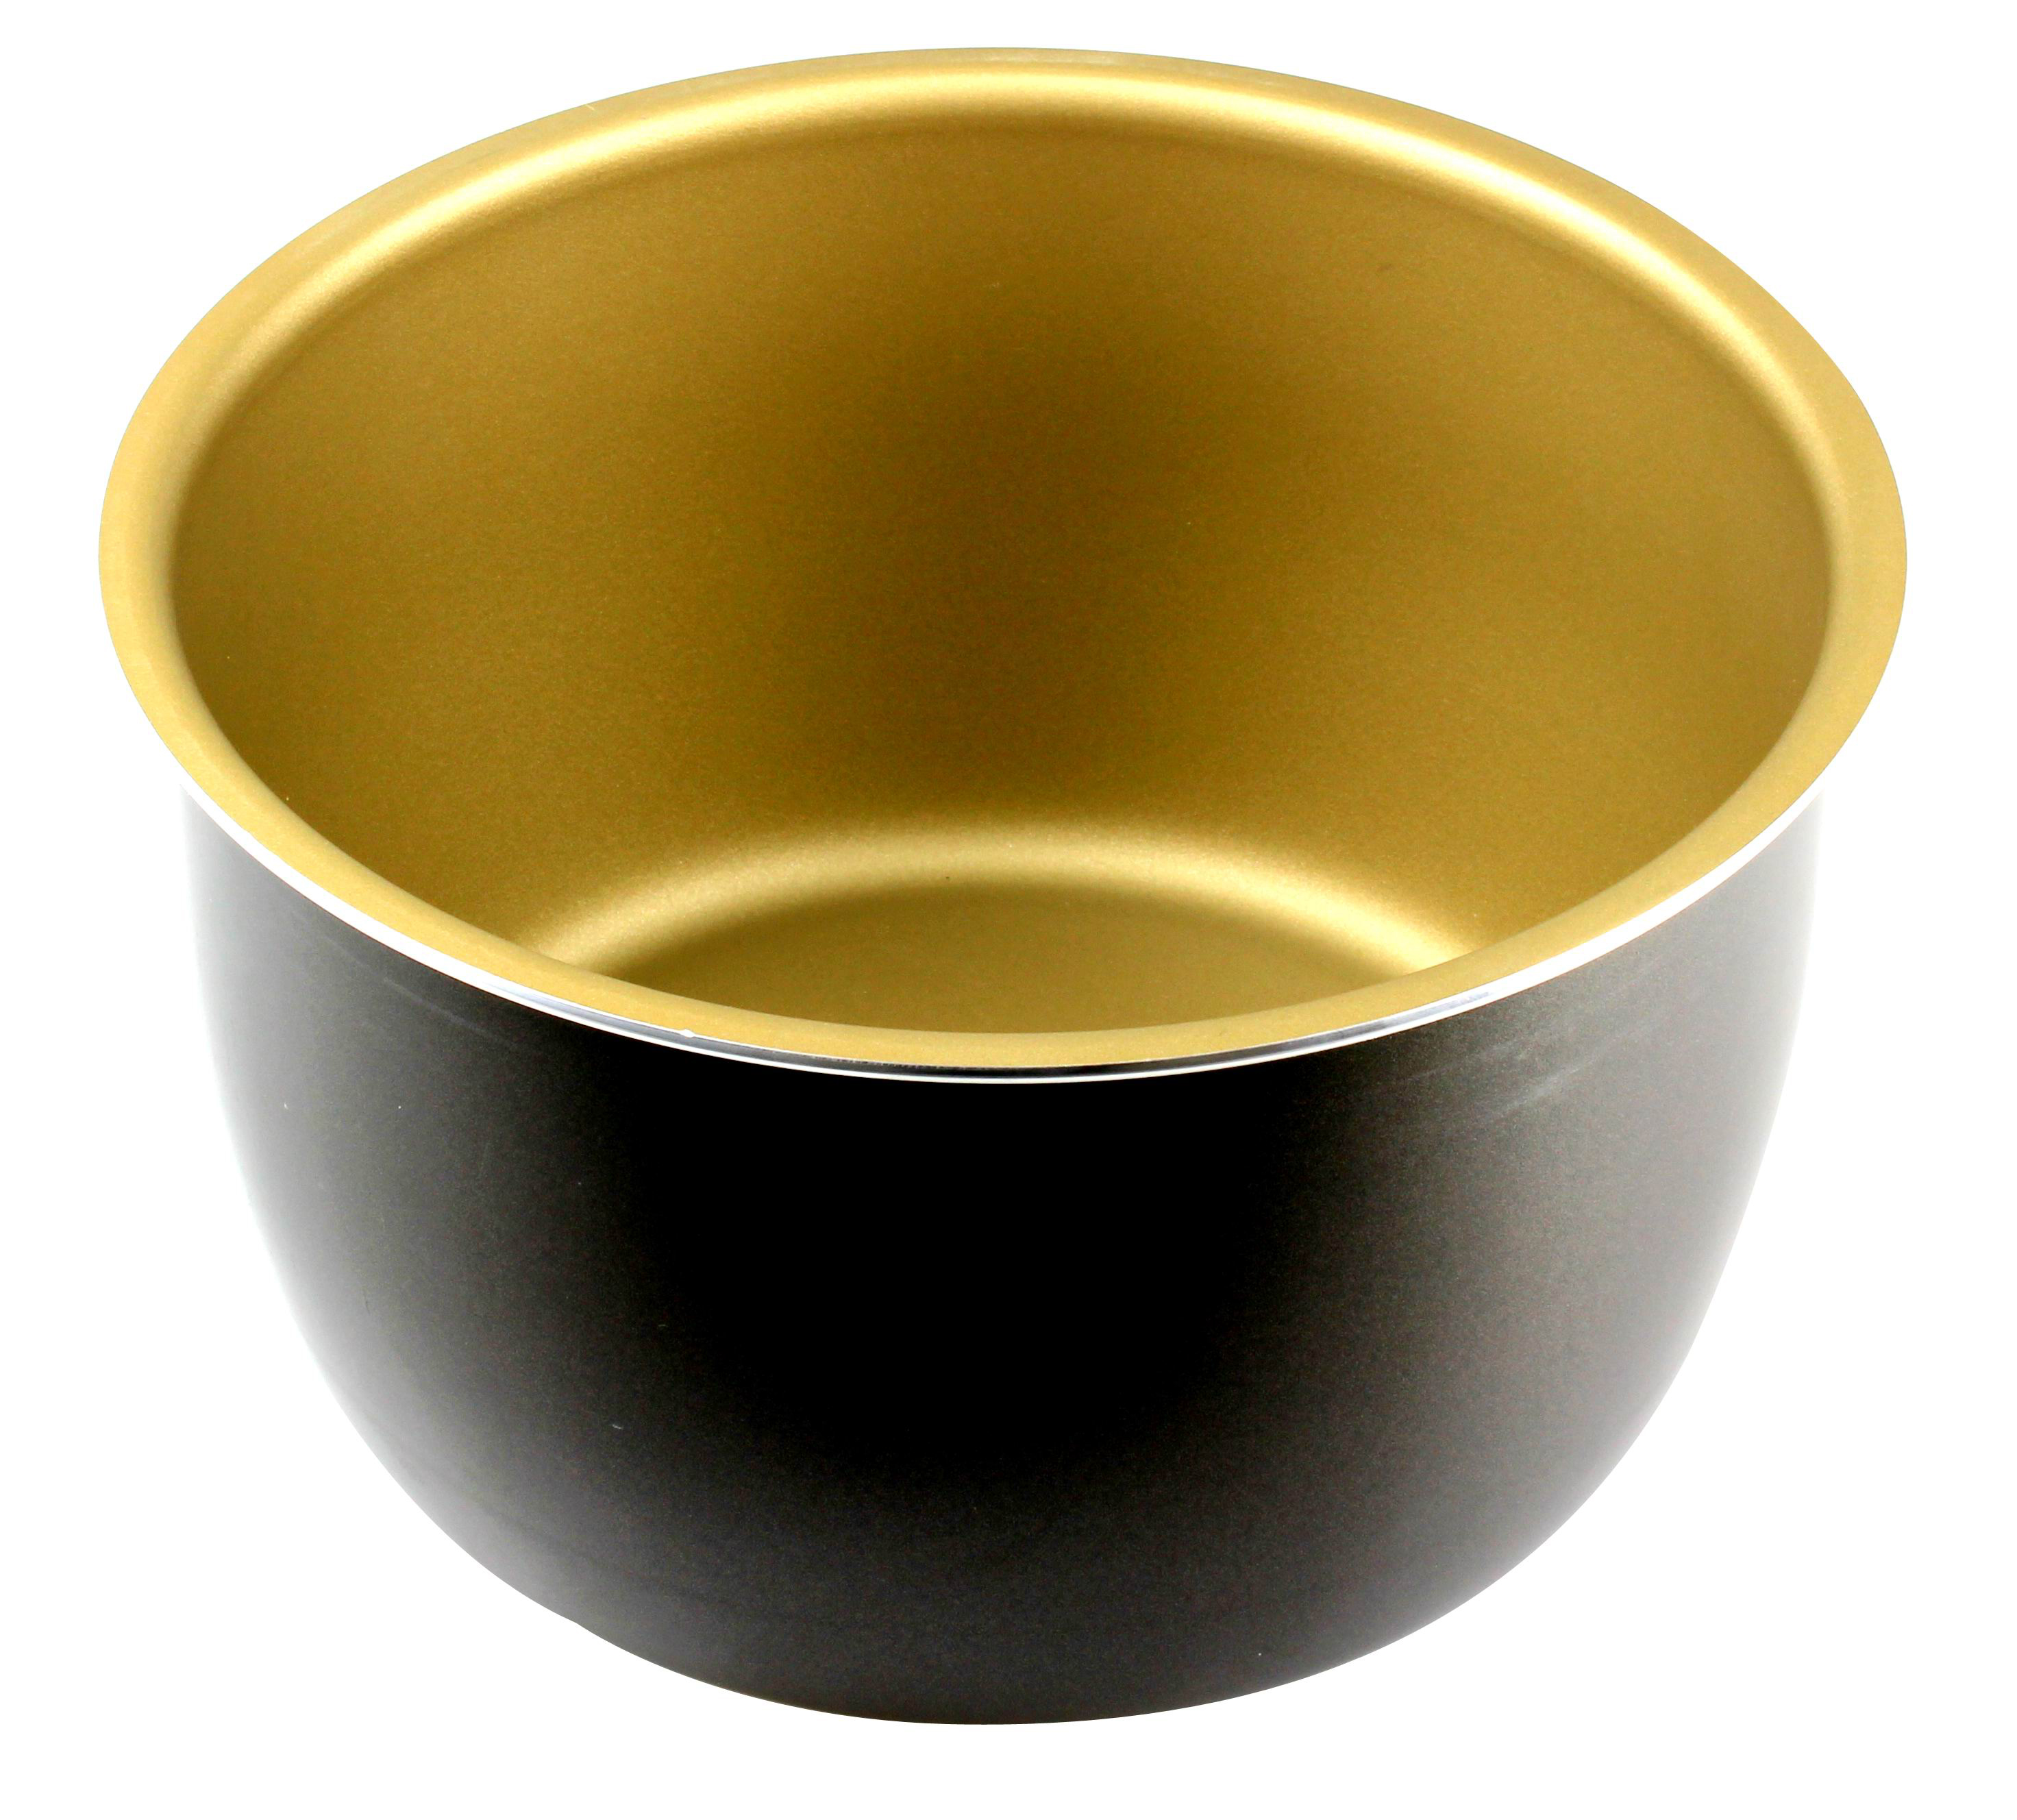 Capacity 8L Liter D08L Aluminum Quart Inner pot for Pressure Cooker OEM Power Sales Color Material Electric Household